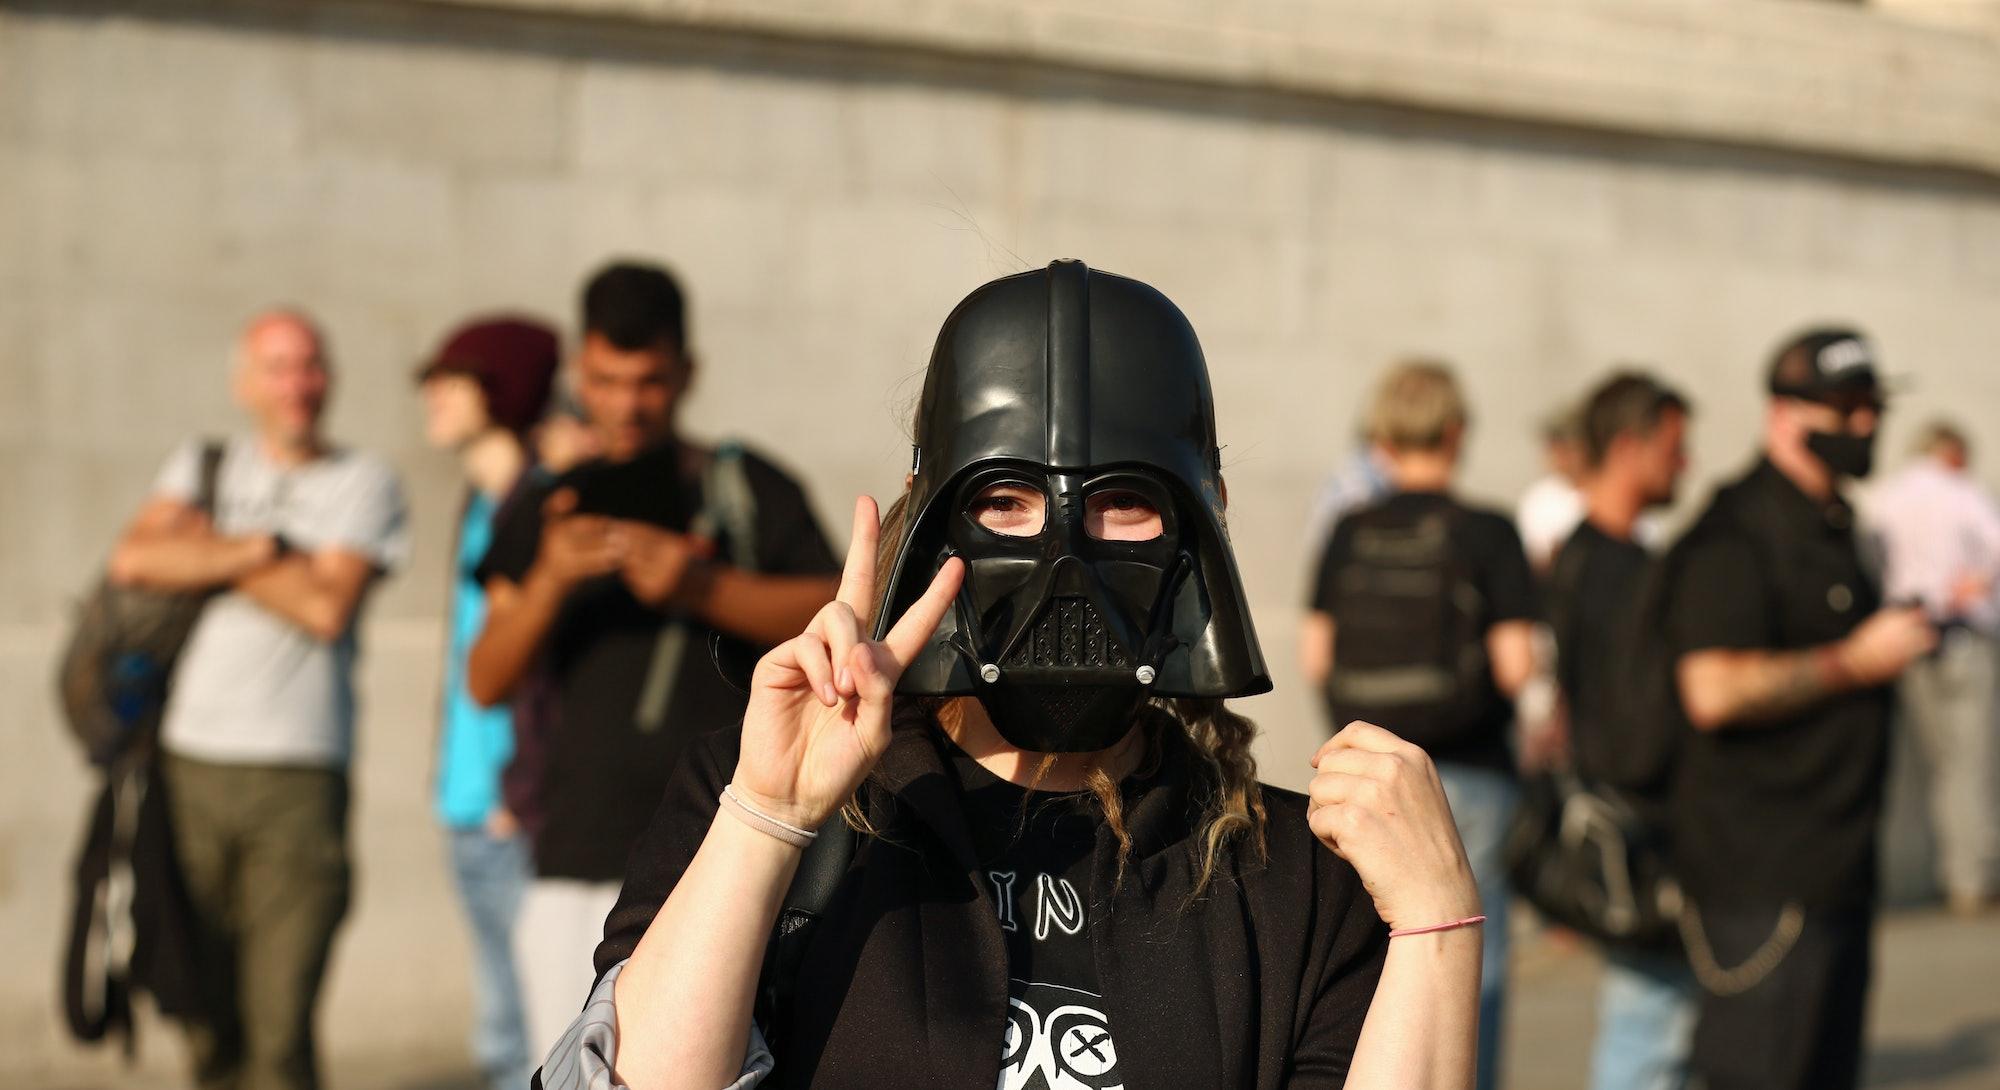 A demonstater in a Darth Vader mask star wars political protest